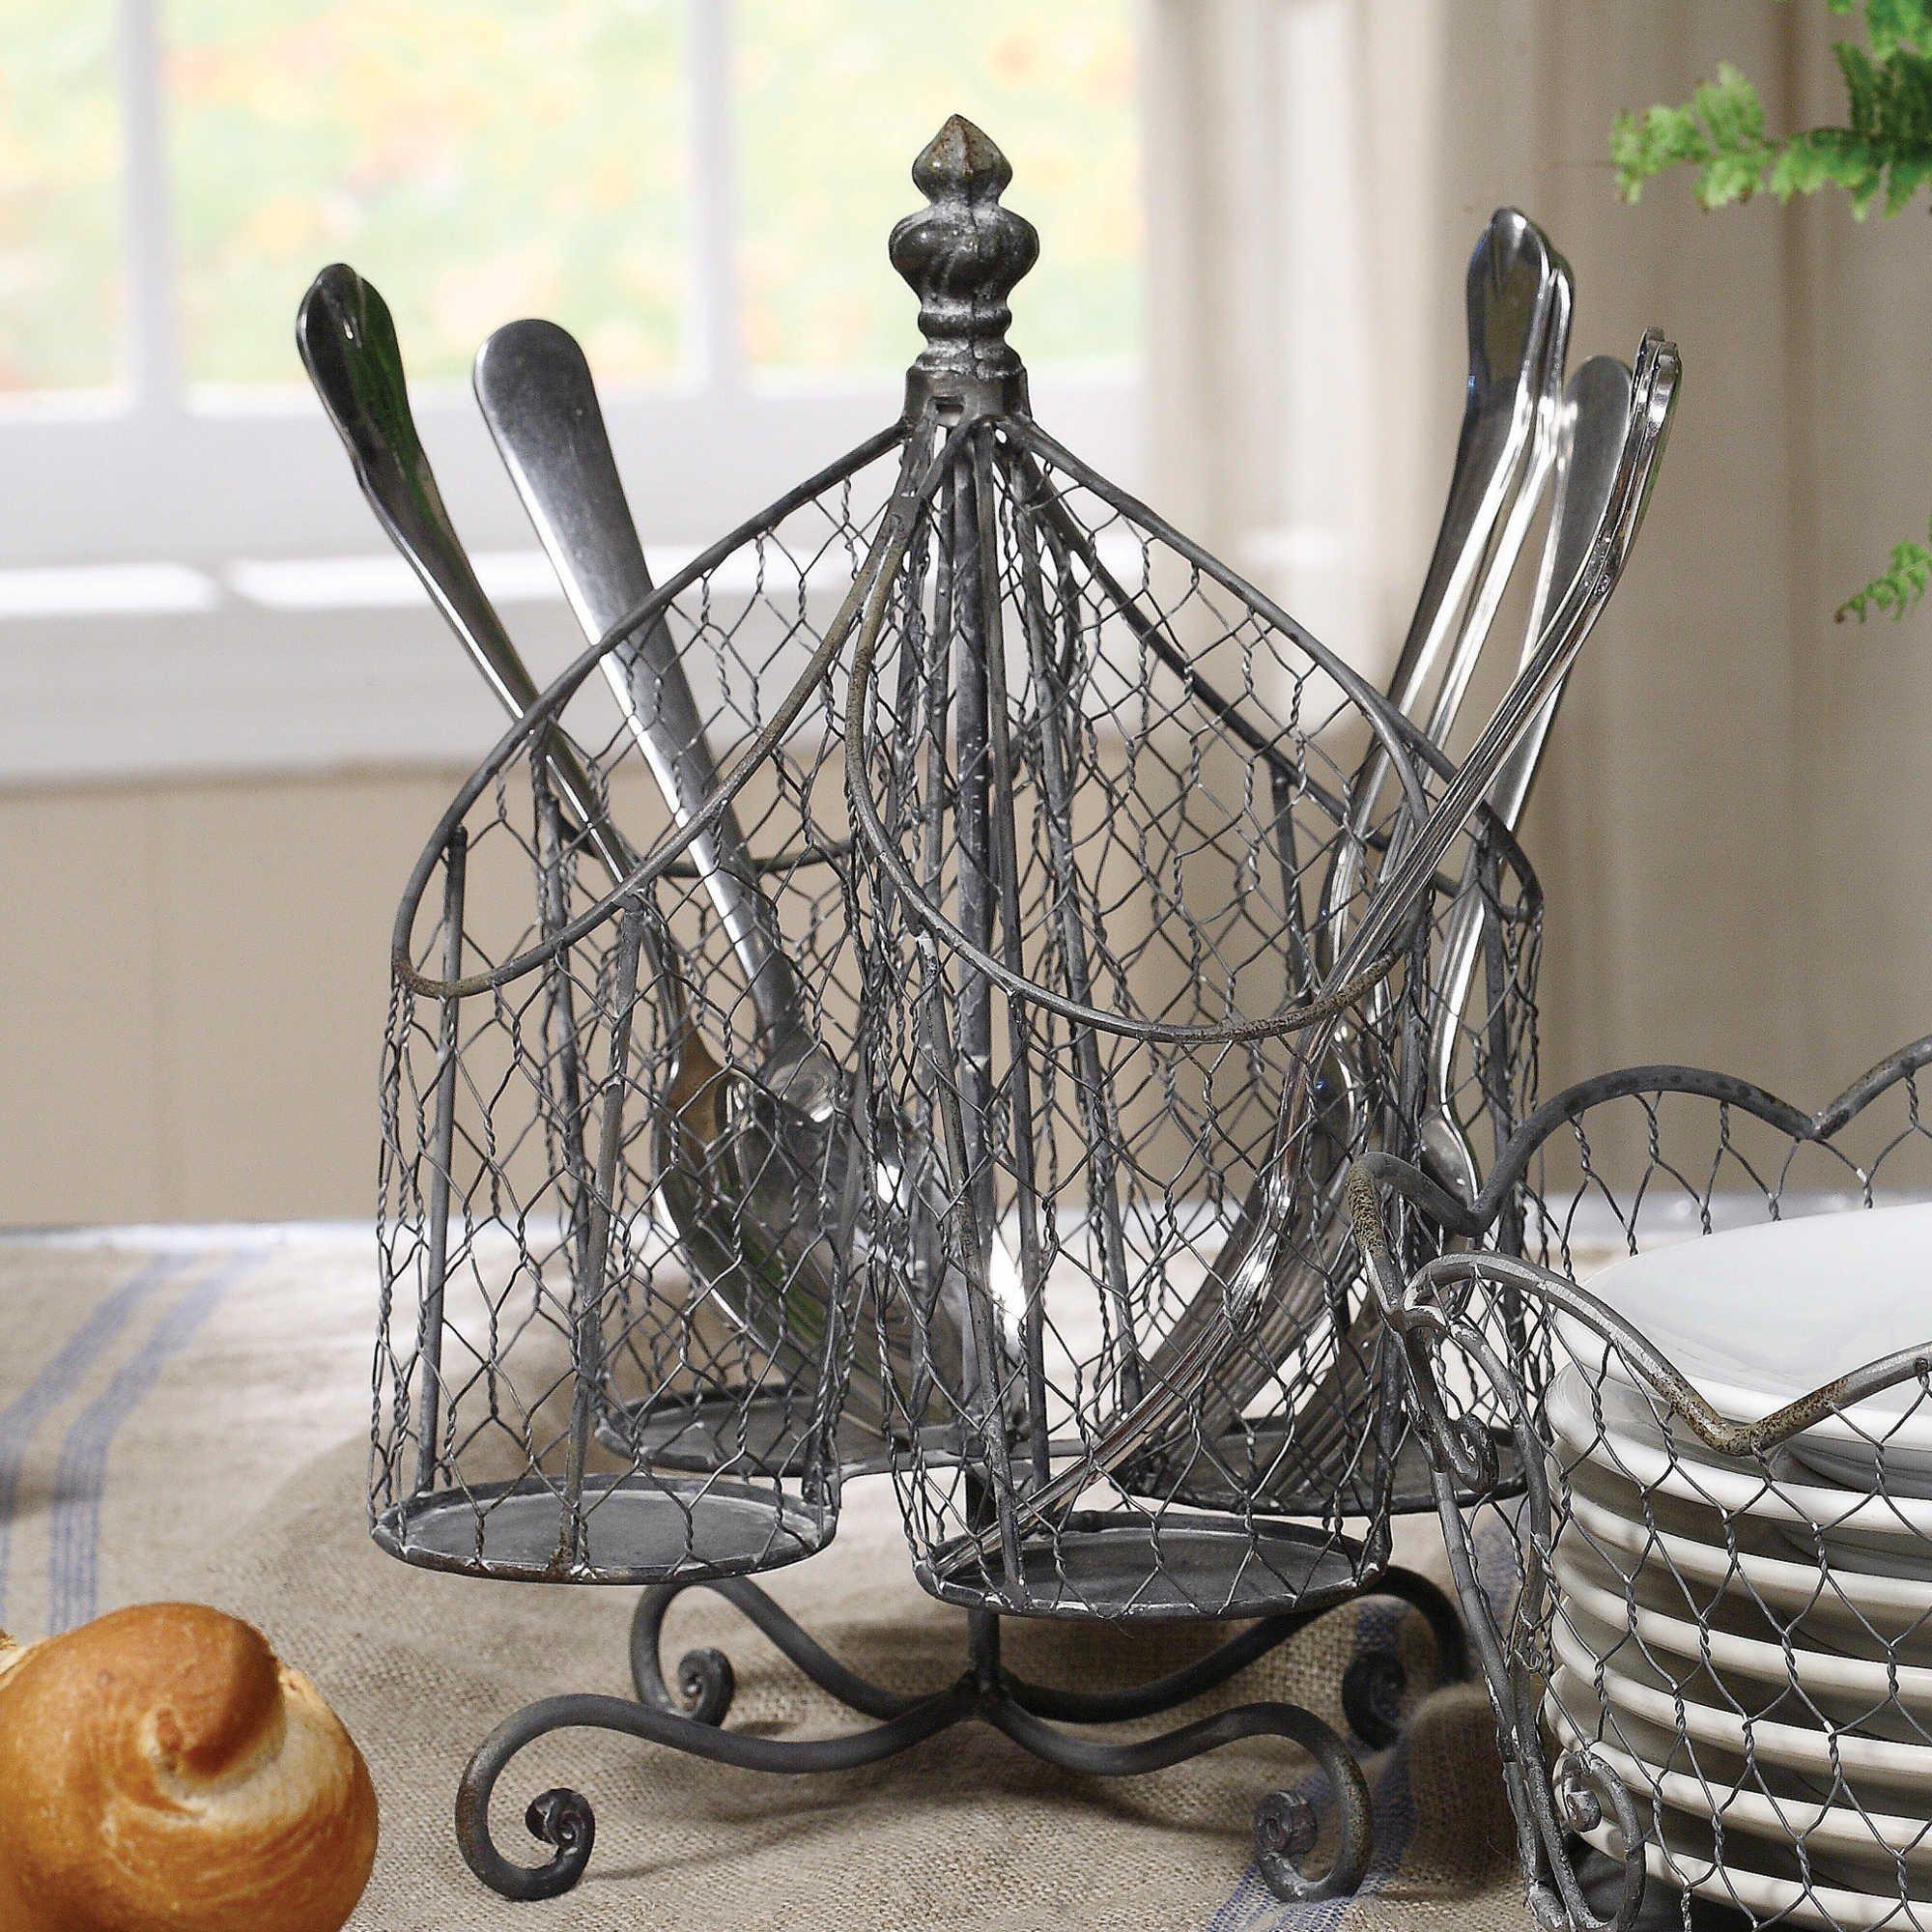 Kitchen Supply Utensil Cutlery Organizer, Holds Napkins, Forks, Spoons, Spatula, Vintage Style [Caddy] Silverware Holder for Kitchen Countertop Storage, Centerpiece